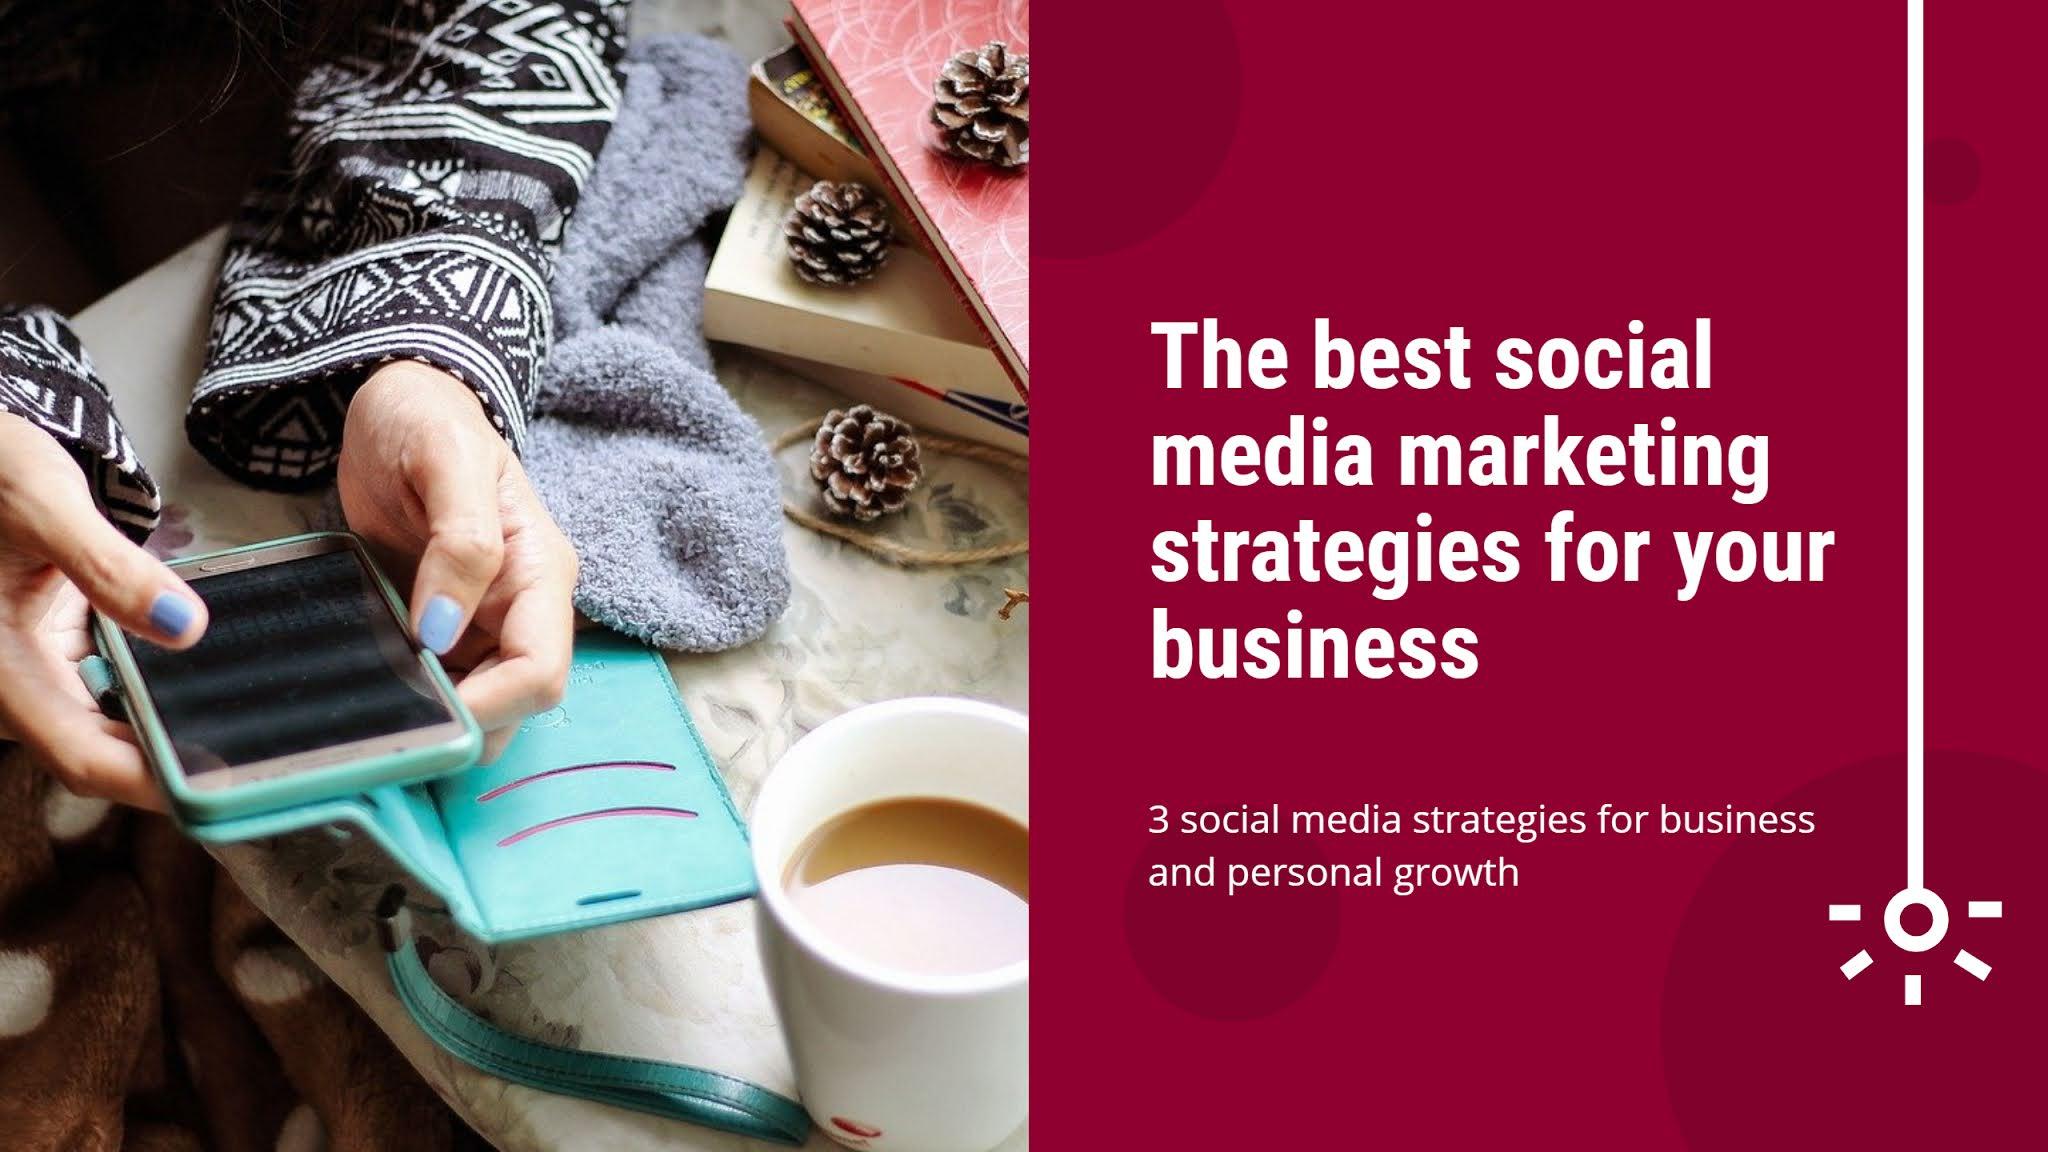 The best social media marketing strategies for your business, 3 social media strategies for business and personal growth, Rajni Yadav